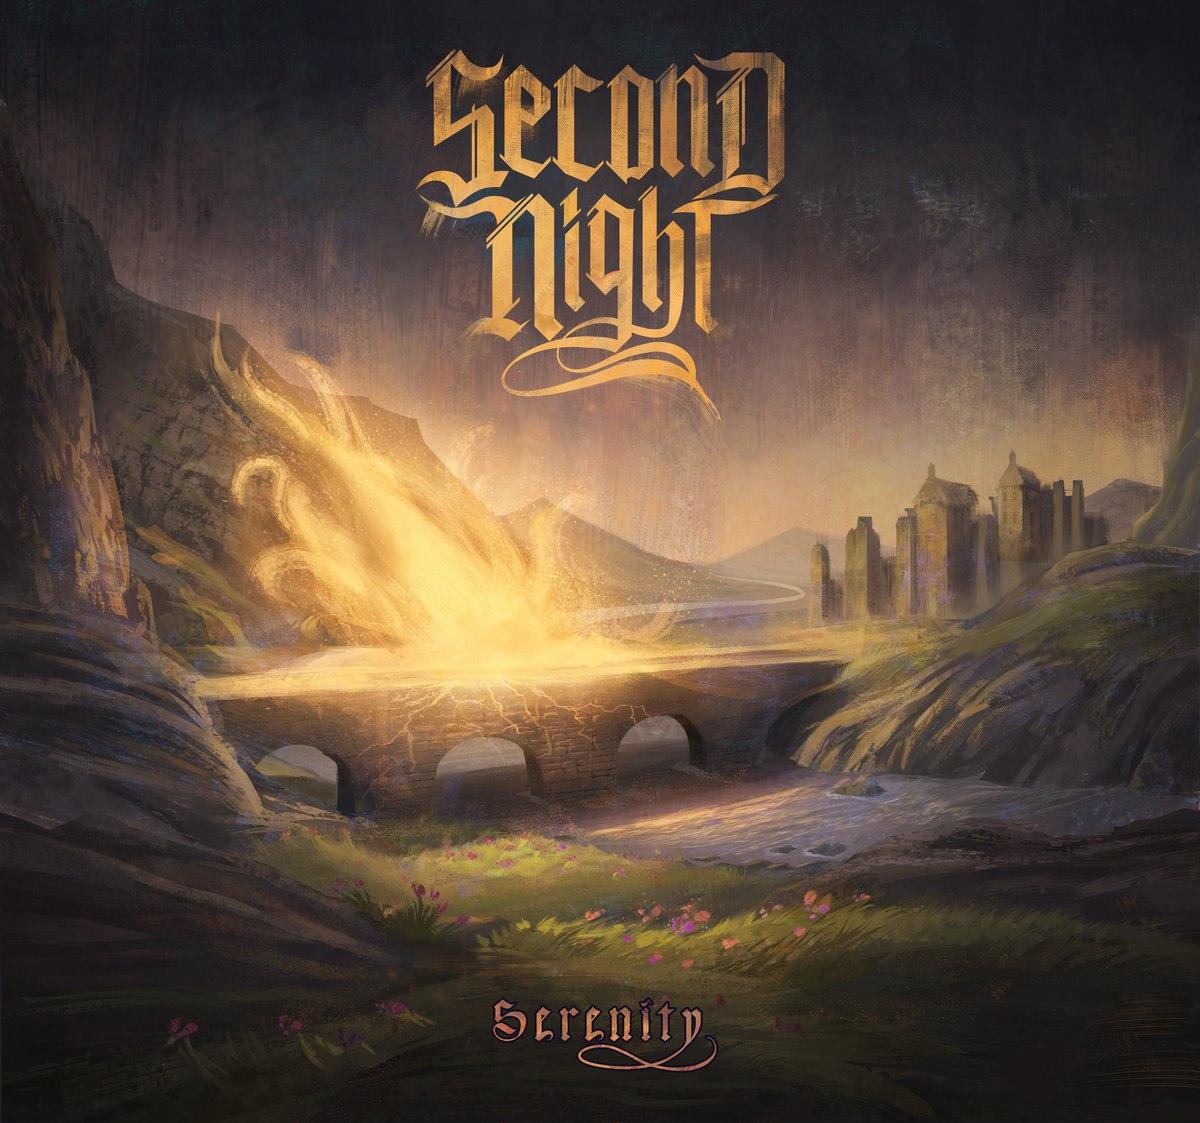 Second Night - Serenity [EP] (2016)